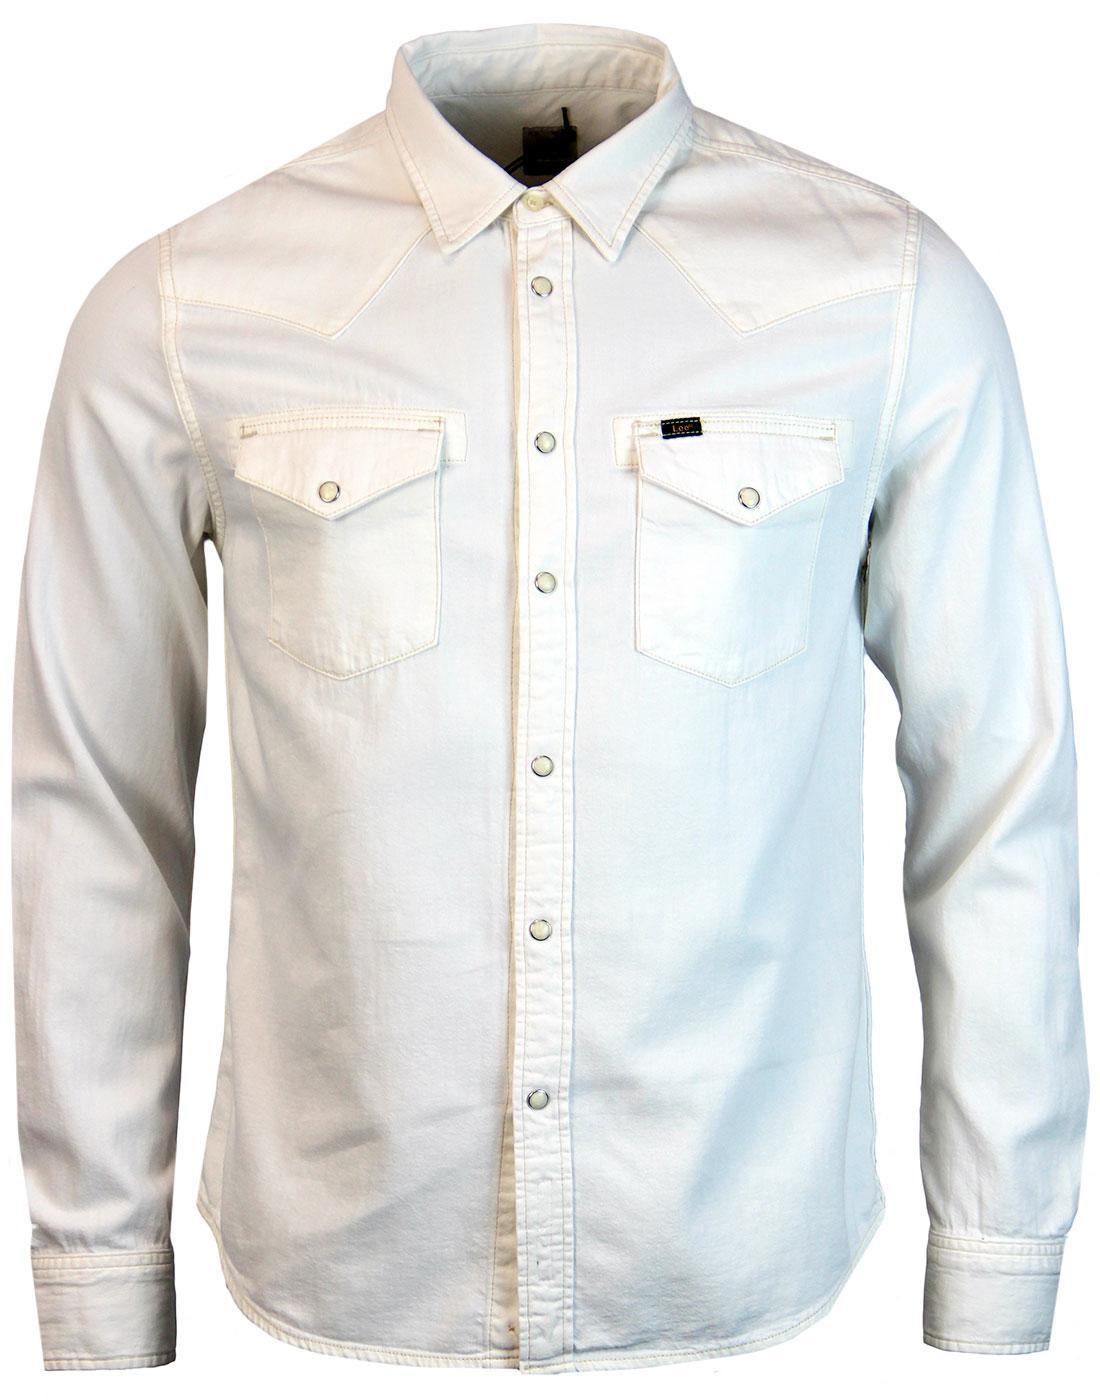 b8a872baaf LEE Jeans Retro 1970s Mod Twin Pocket White Denim Western Shirt